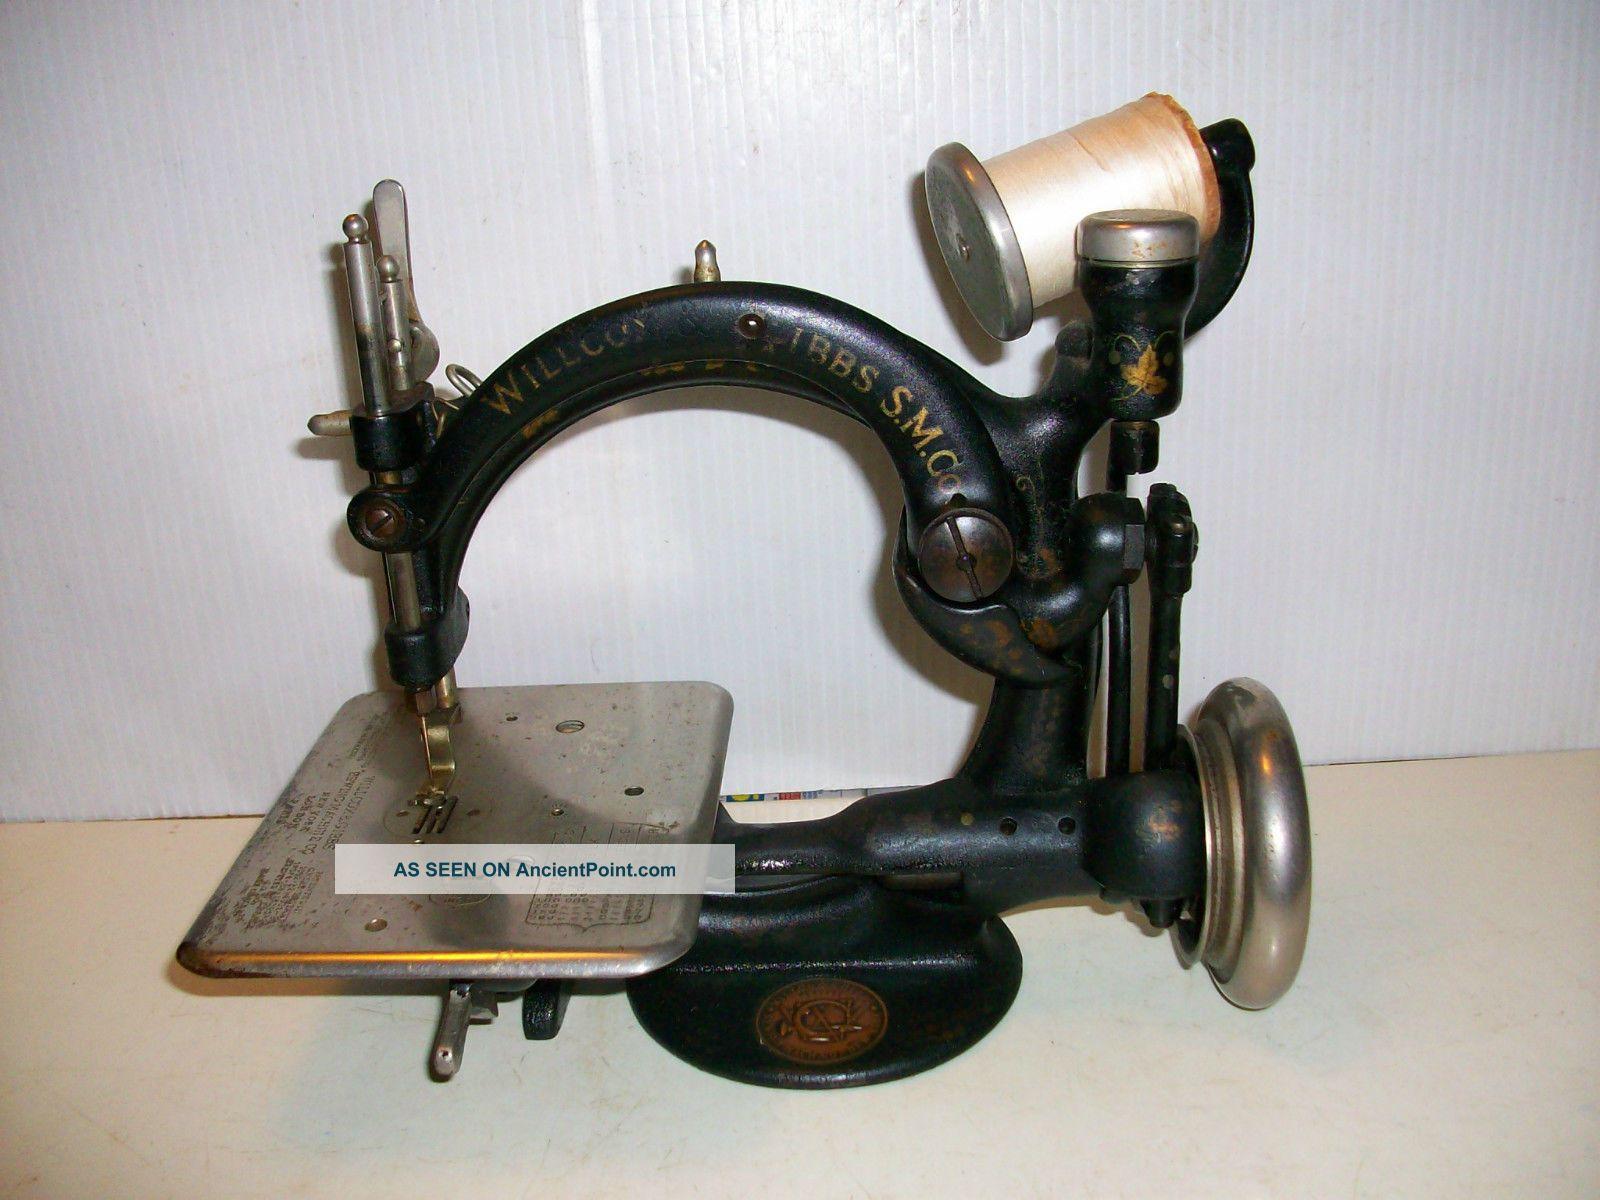 Antique Wilcox Willcox Gibbs Sewing Machine Works 1894 Sewing Machines photo